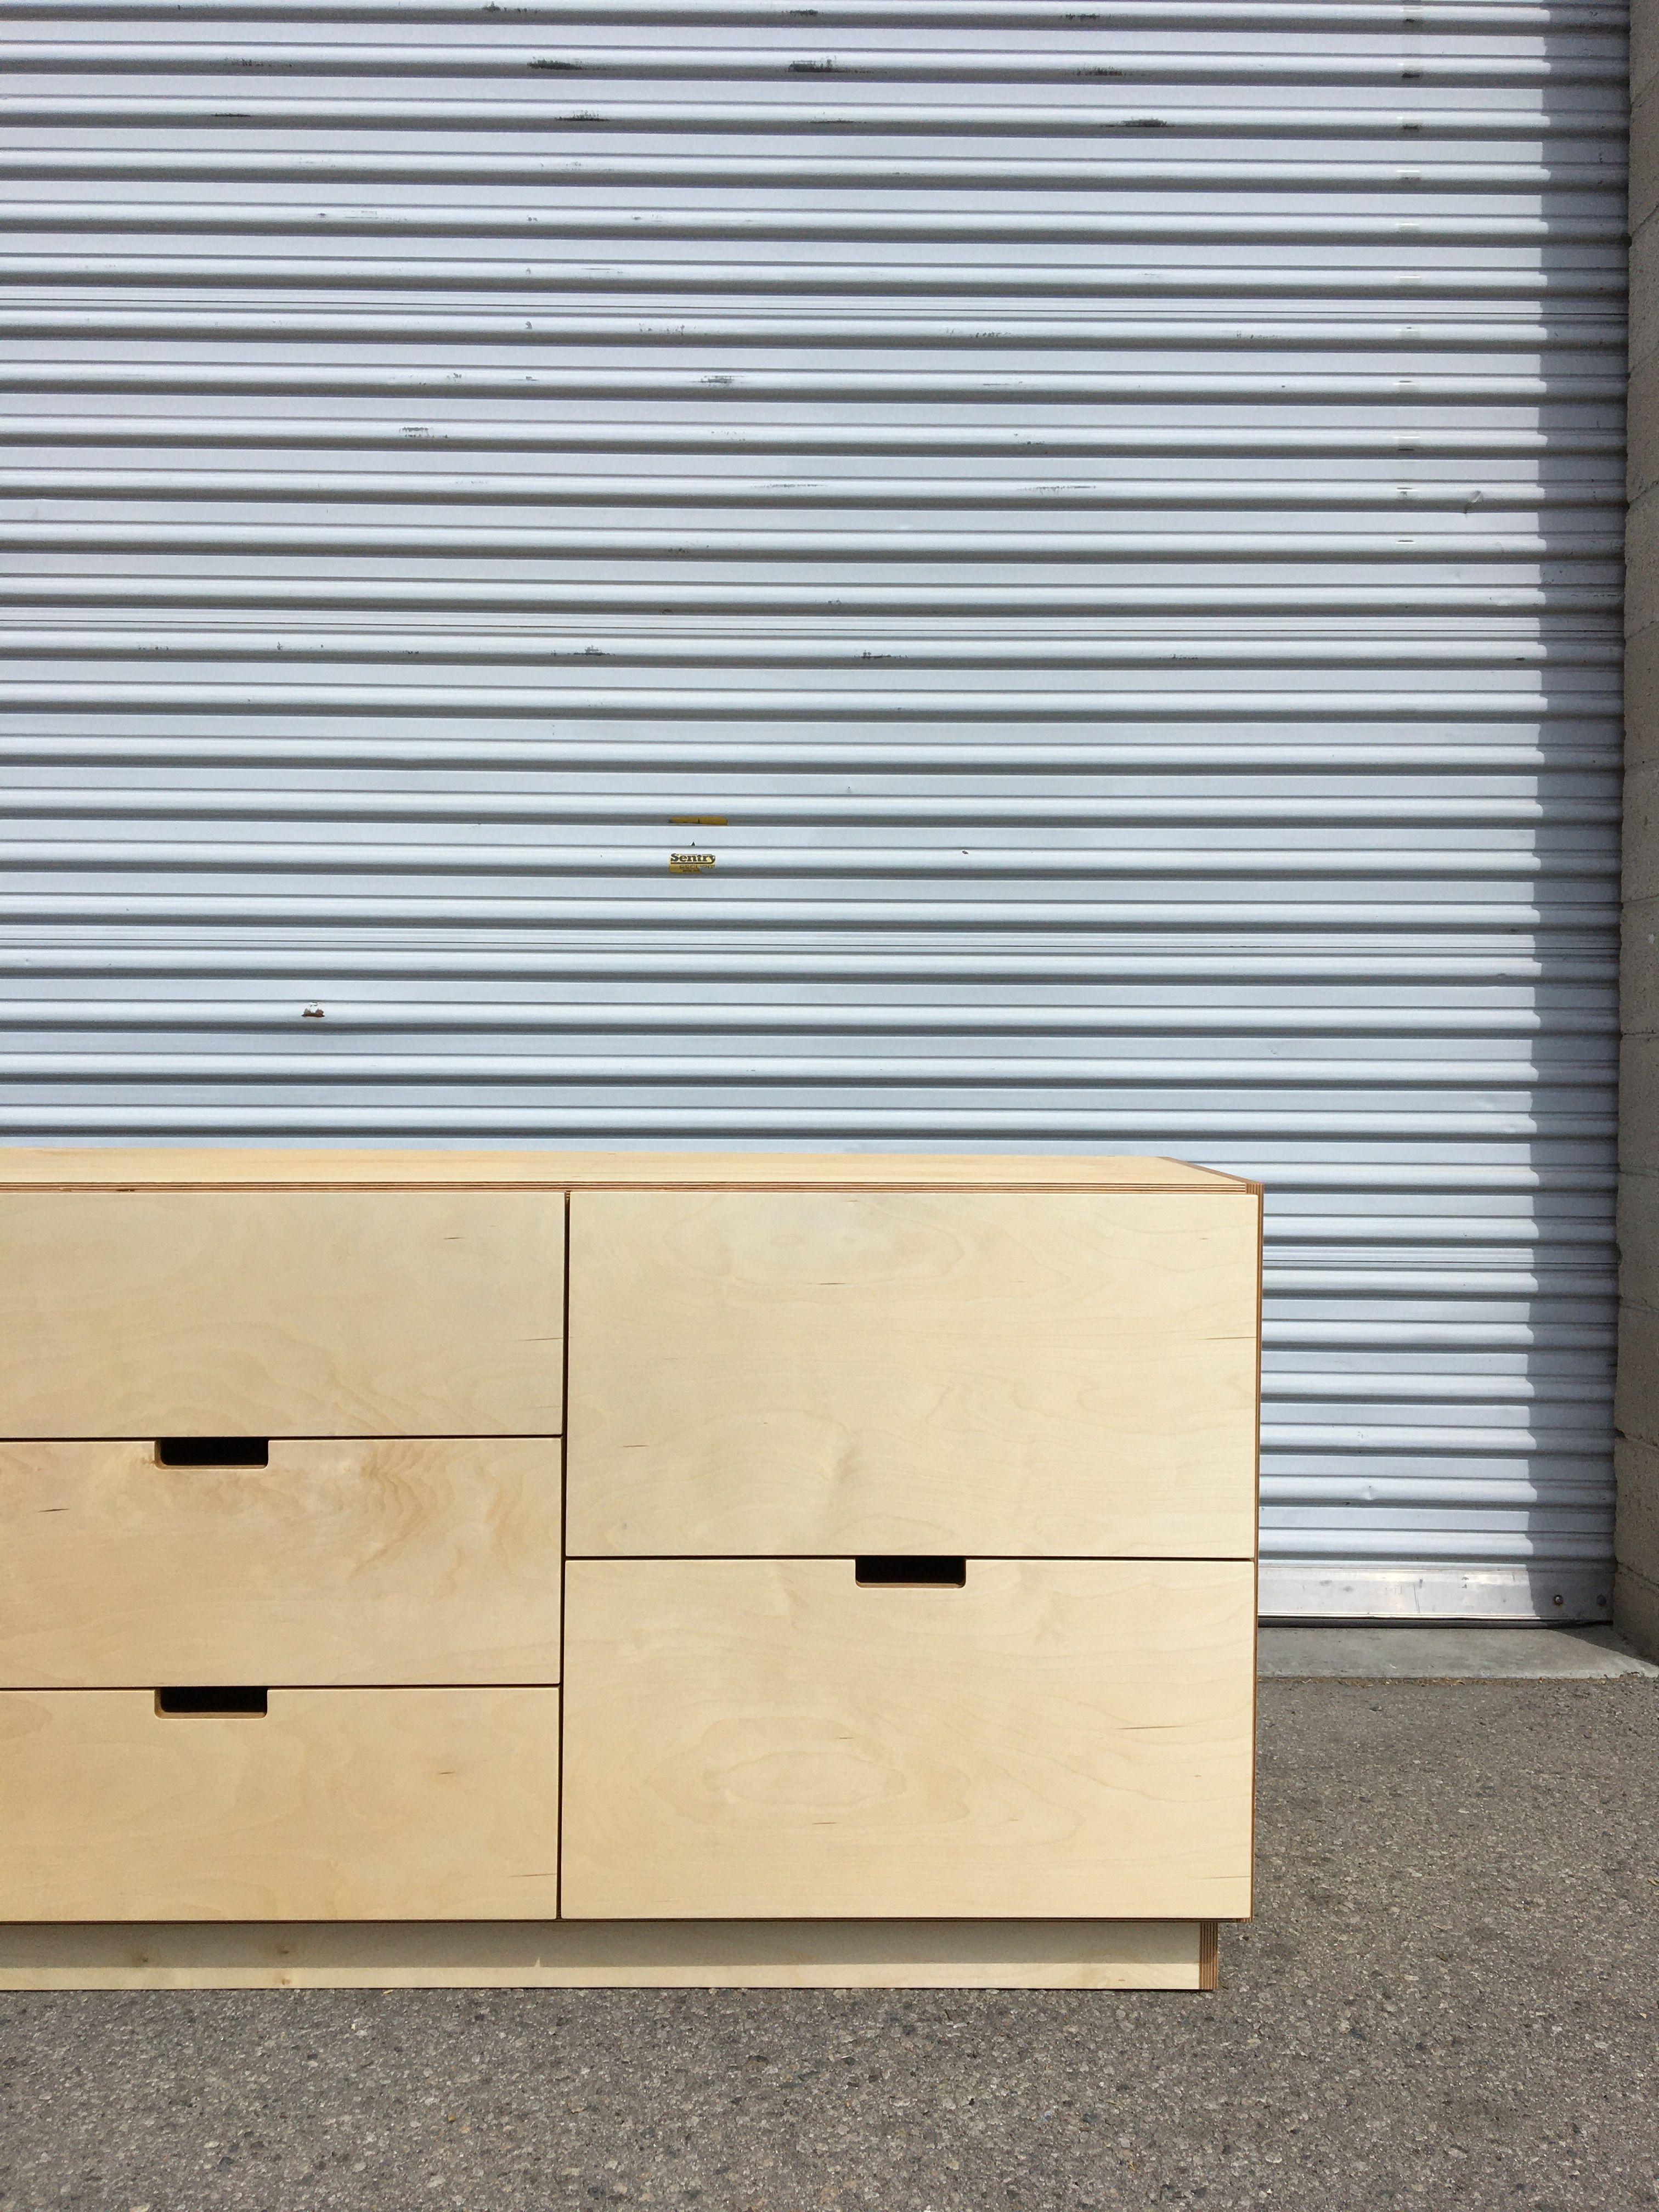 Half Round Dresser - Wide product image 3